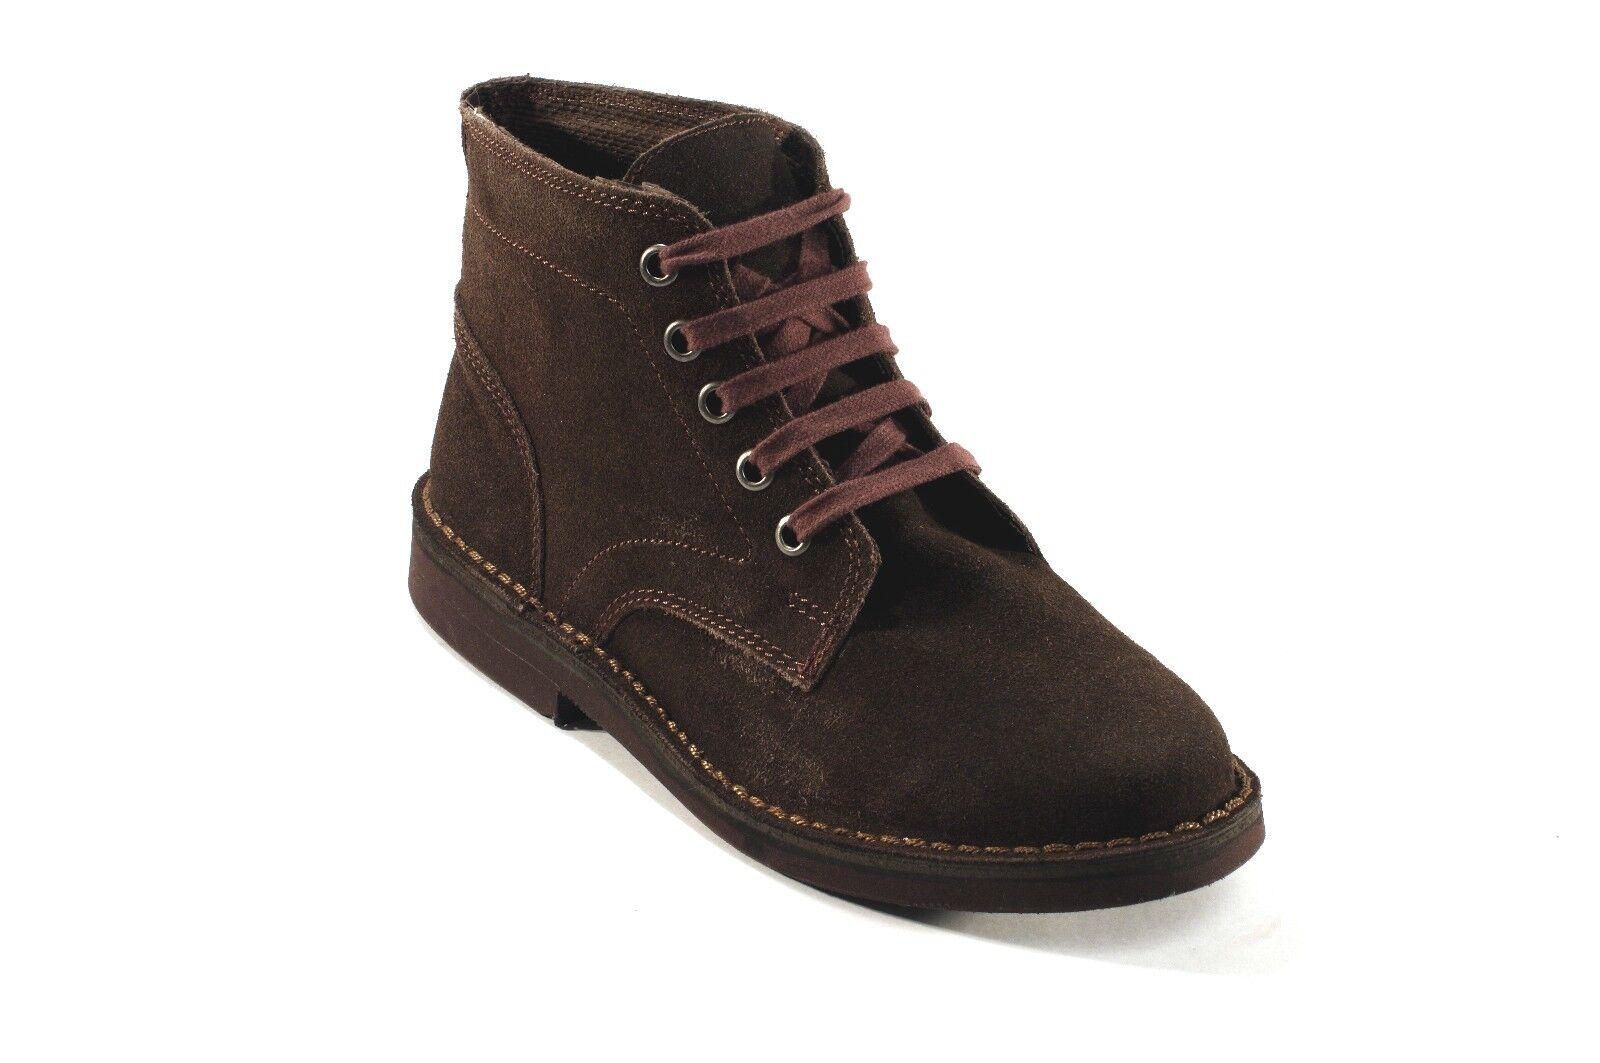 Wide Fit Shoes Men's 4E Extra Wide Saber Boots